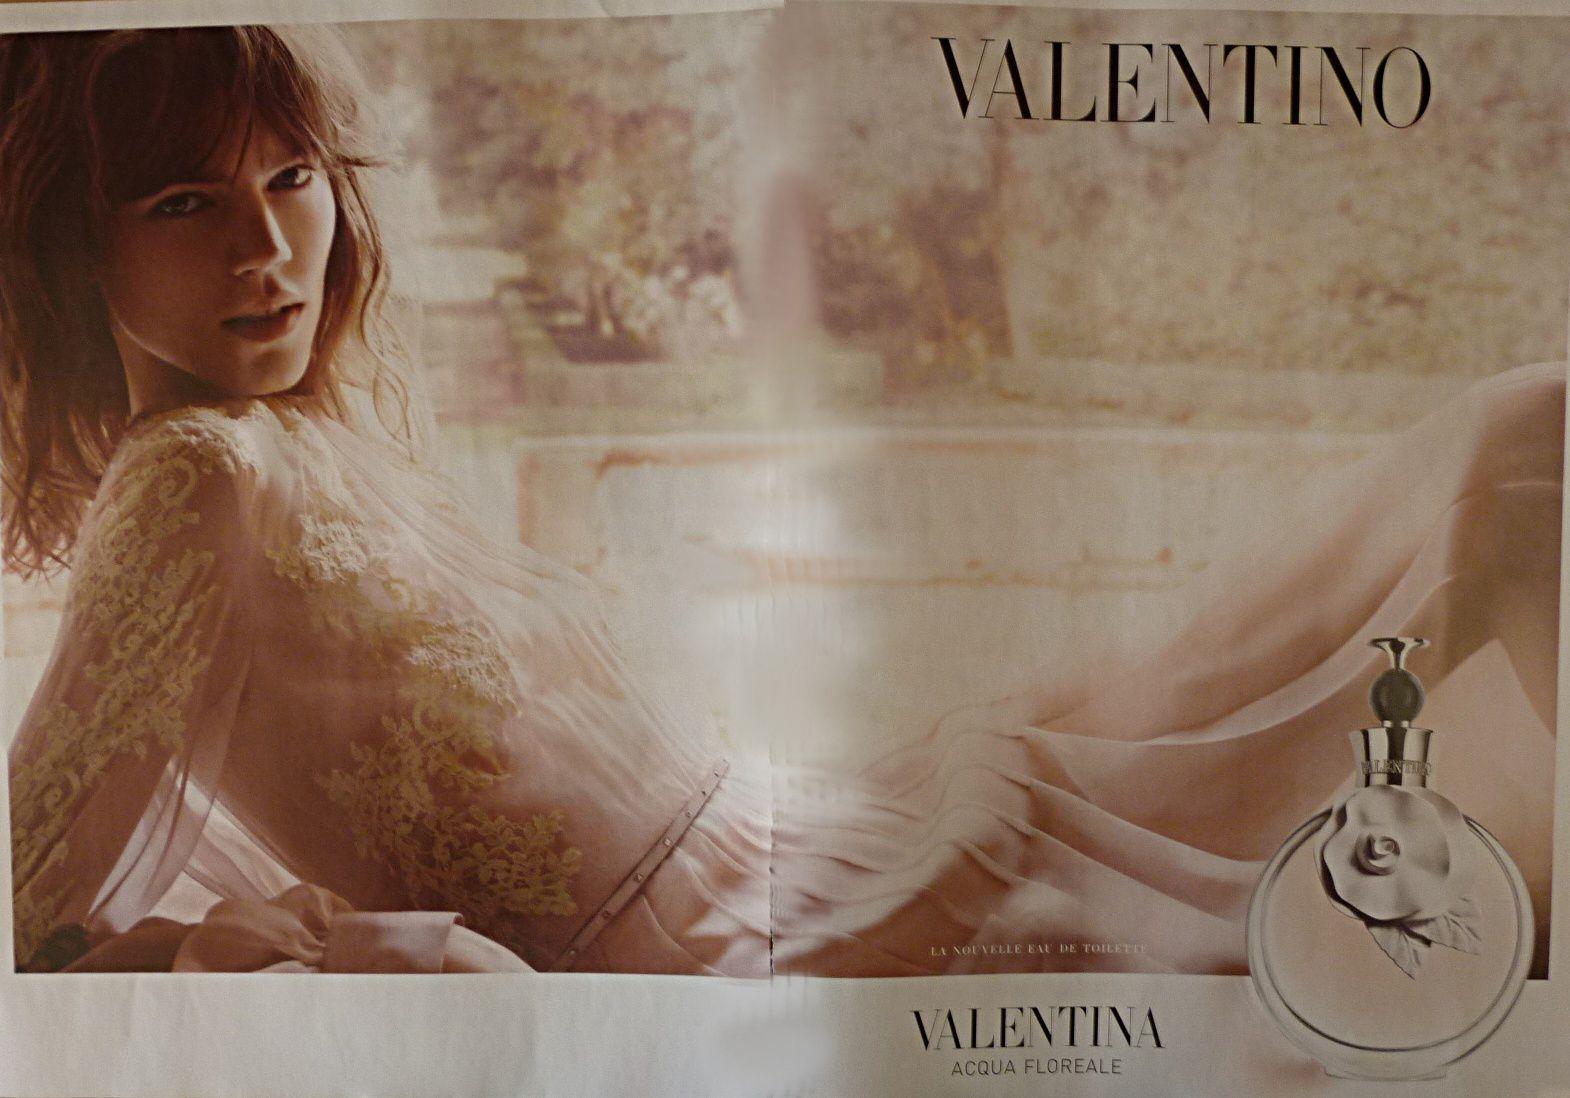 Valentina de VALENTINO